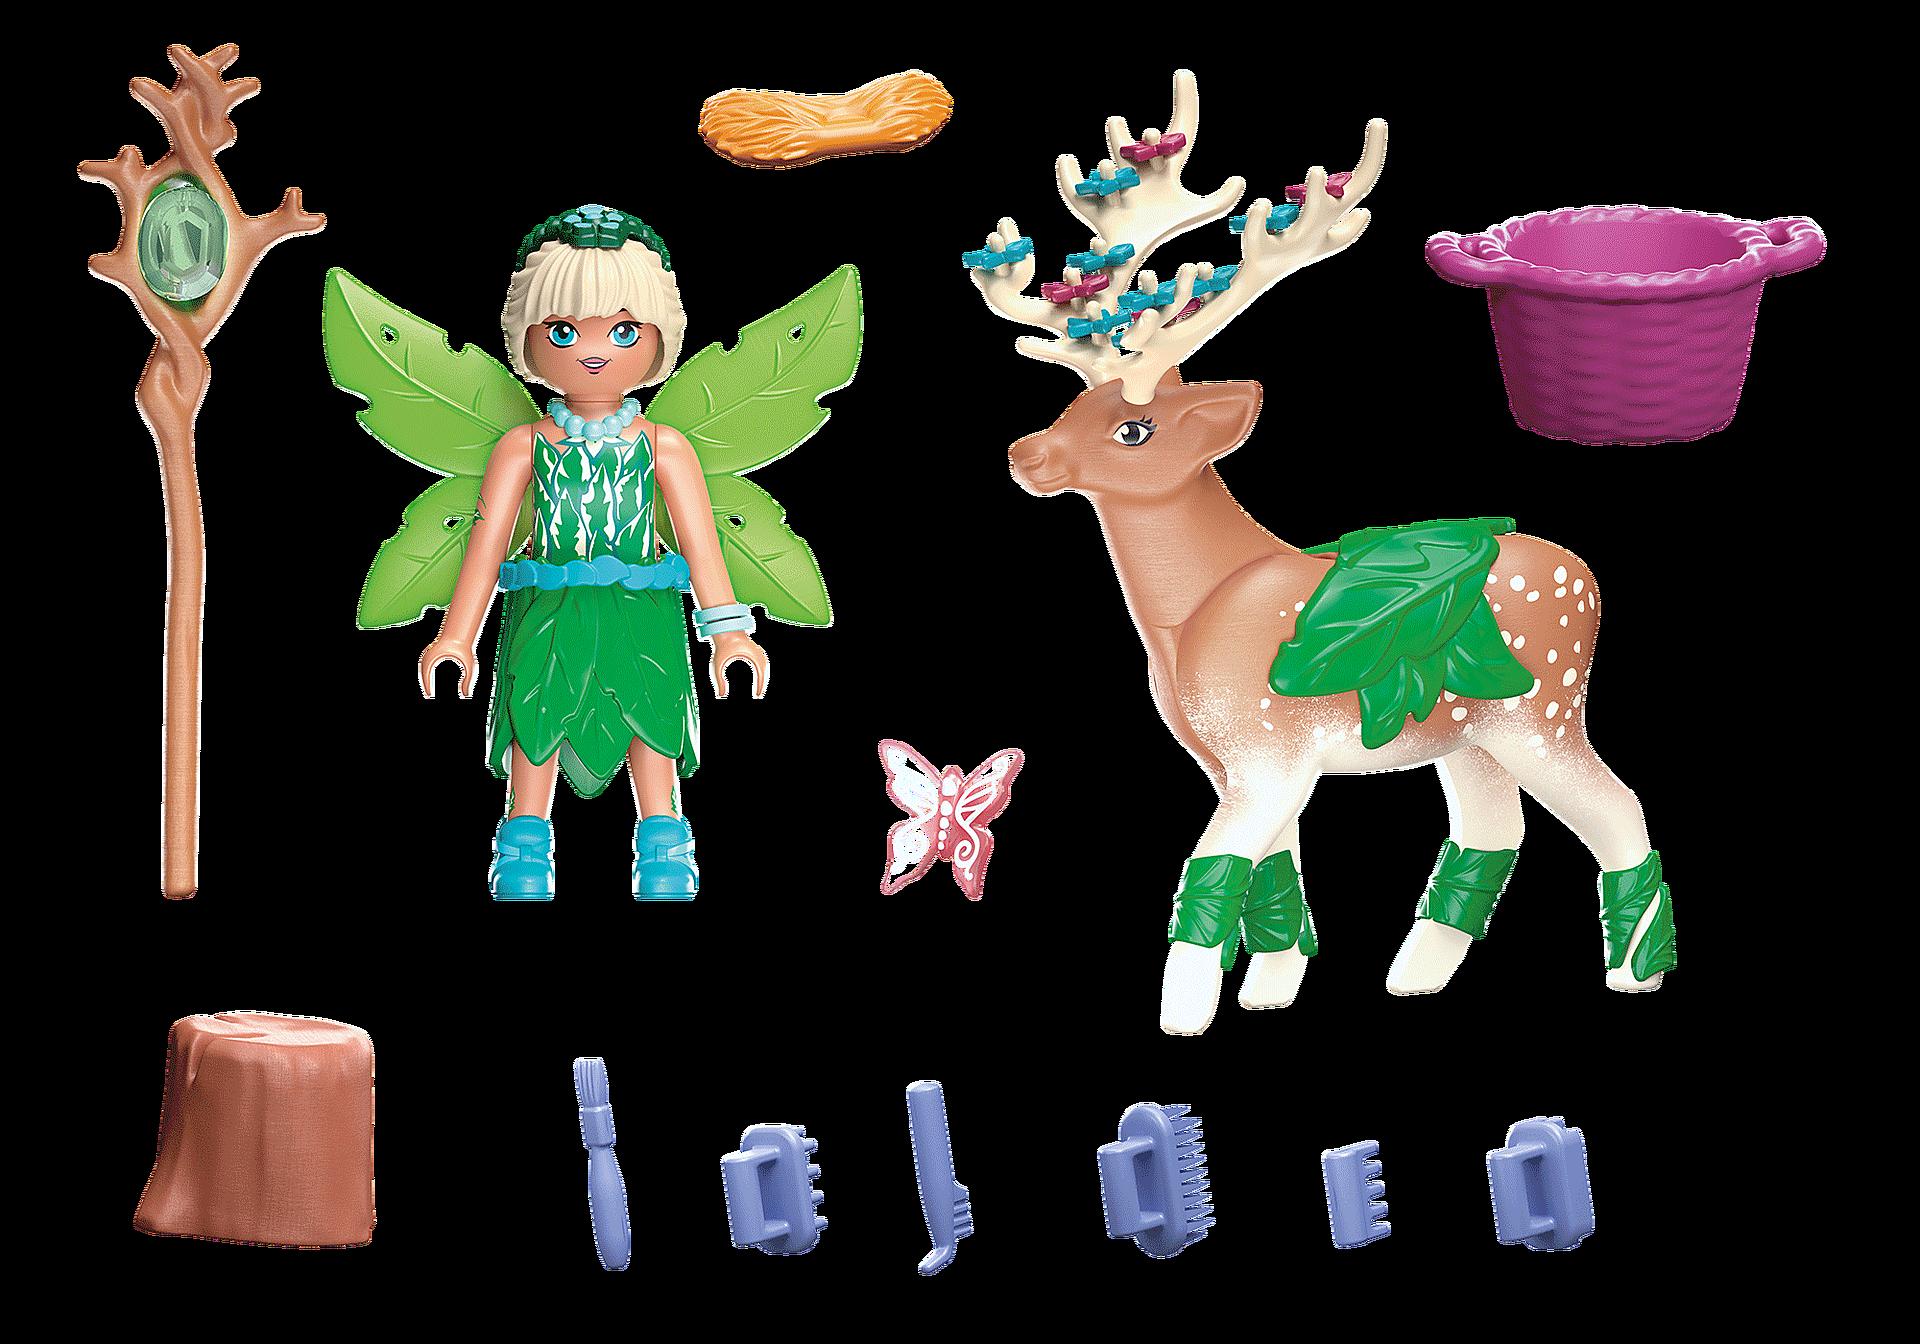 70806 Forest Fairy met totemdier zoom image4